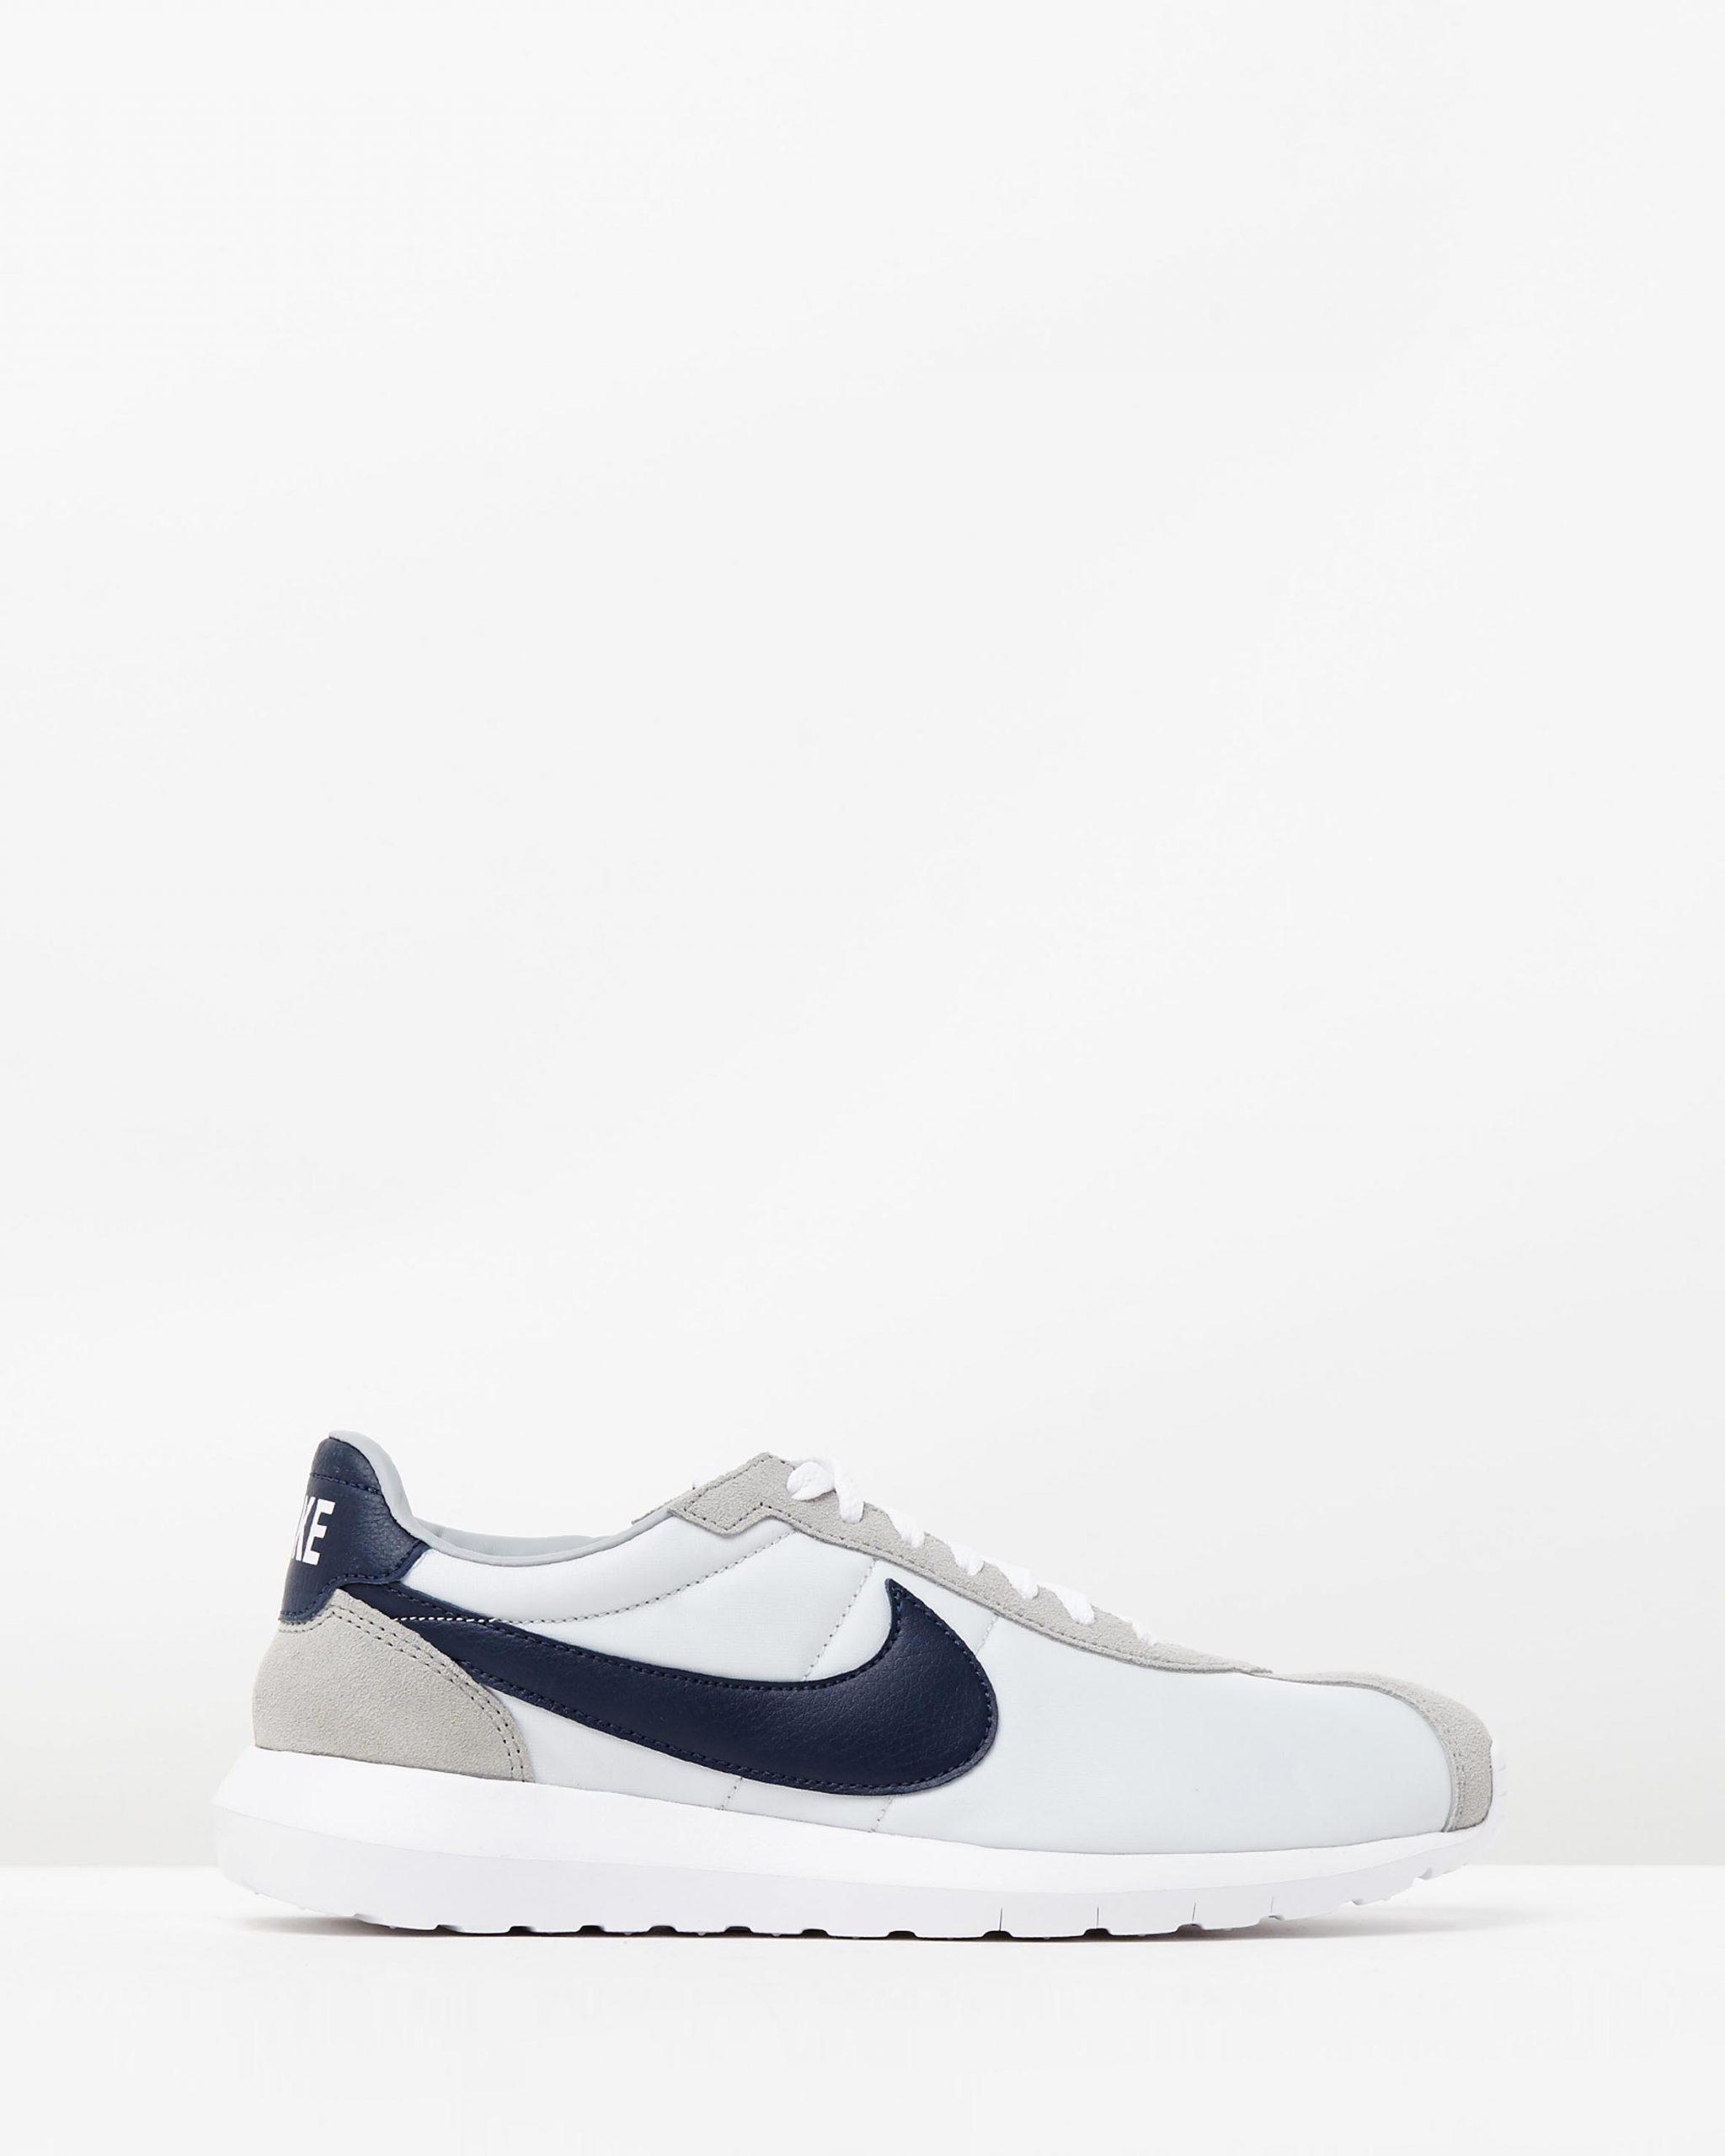 Nike Roshe LD-1000 QS Pure Platinum